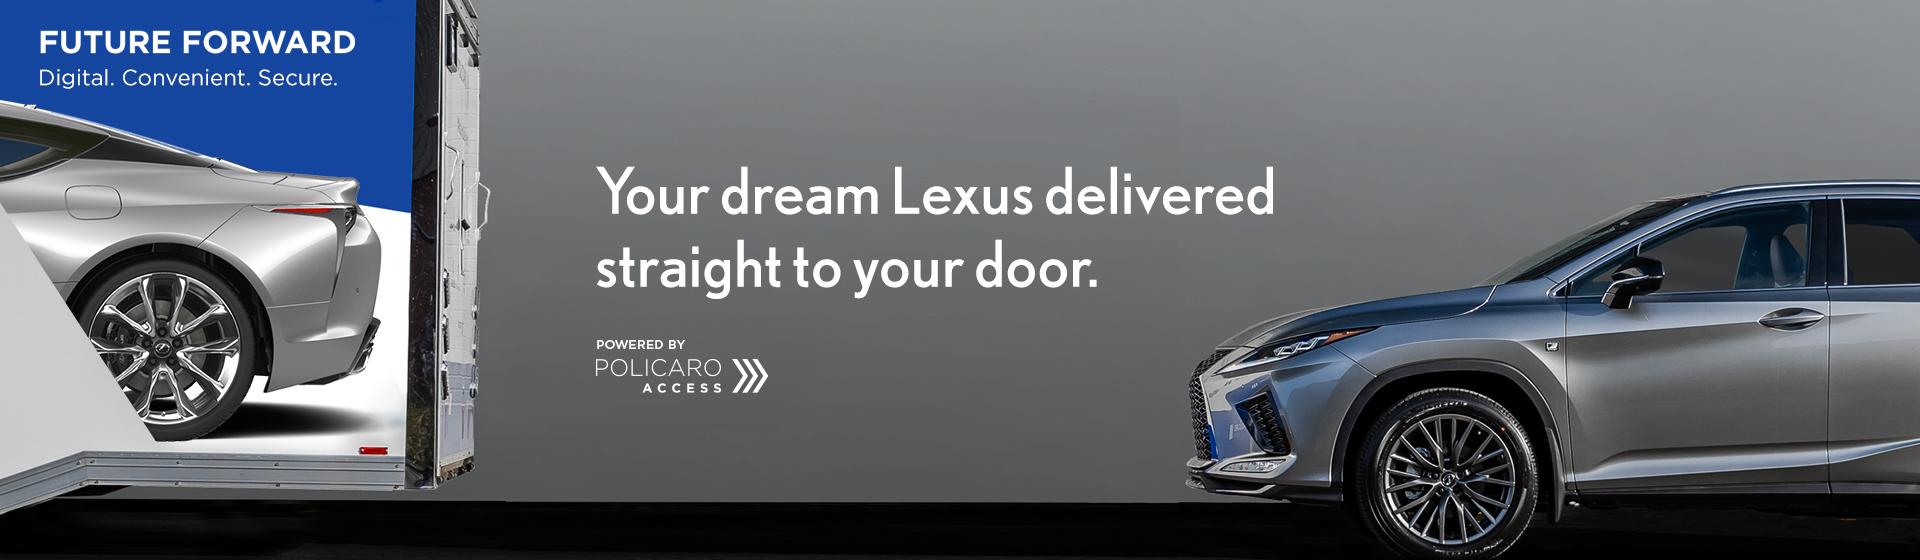 Northwest Lexus Home Delivery